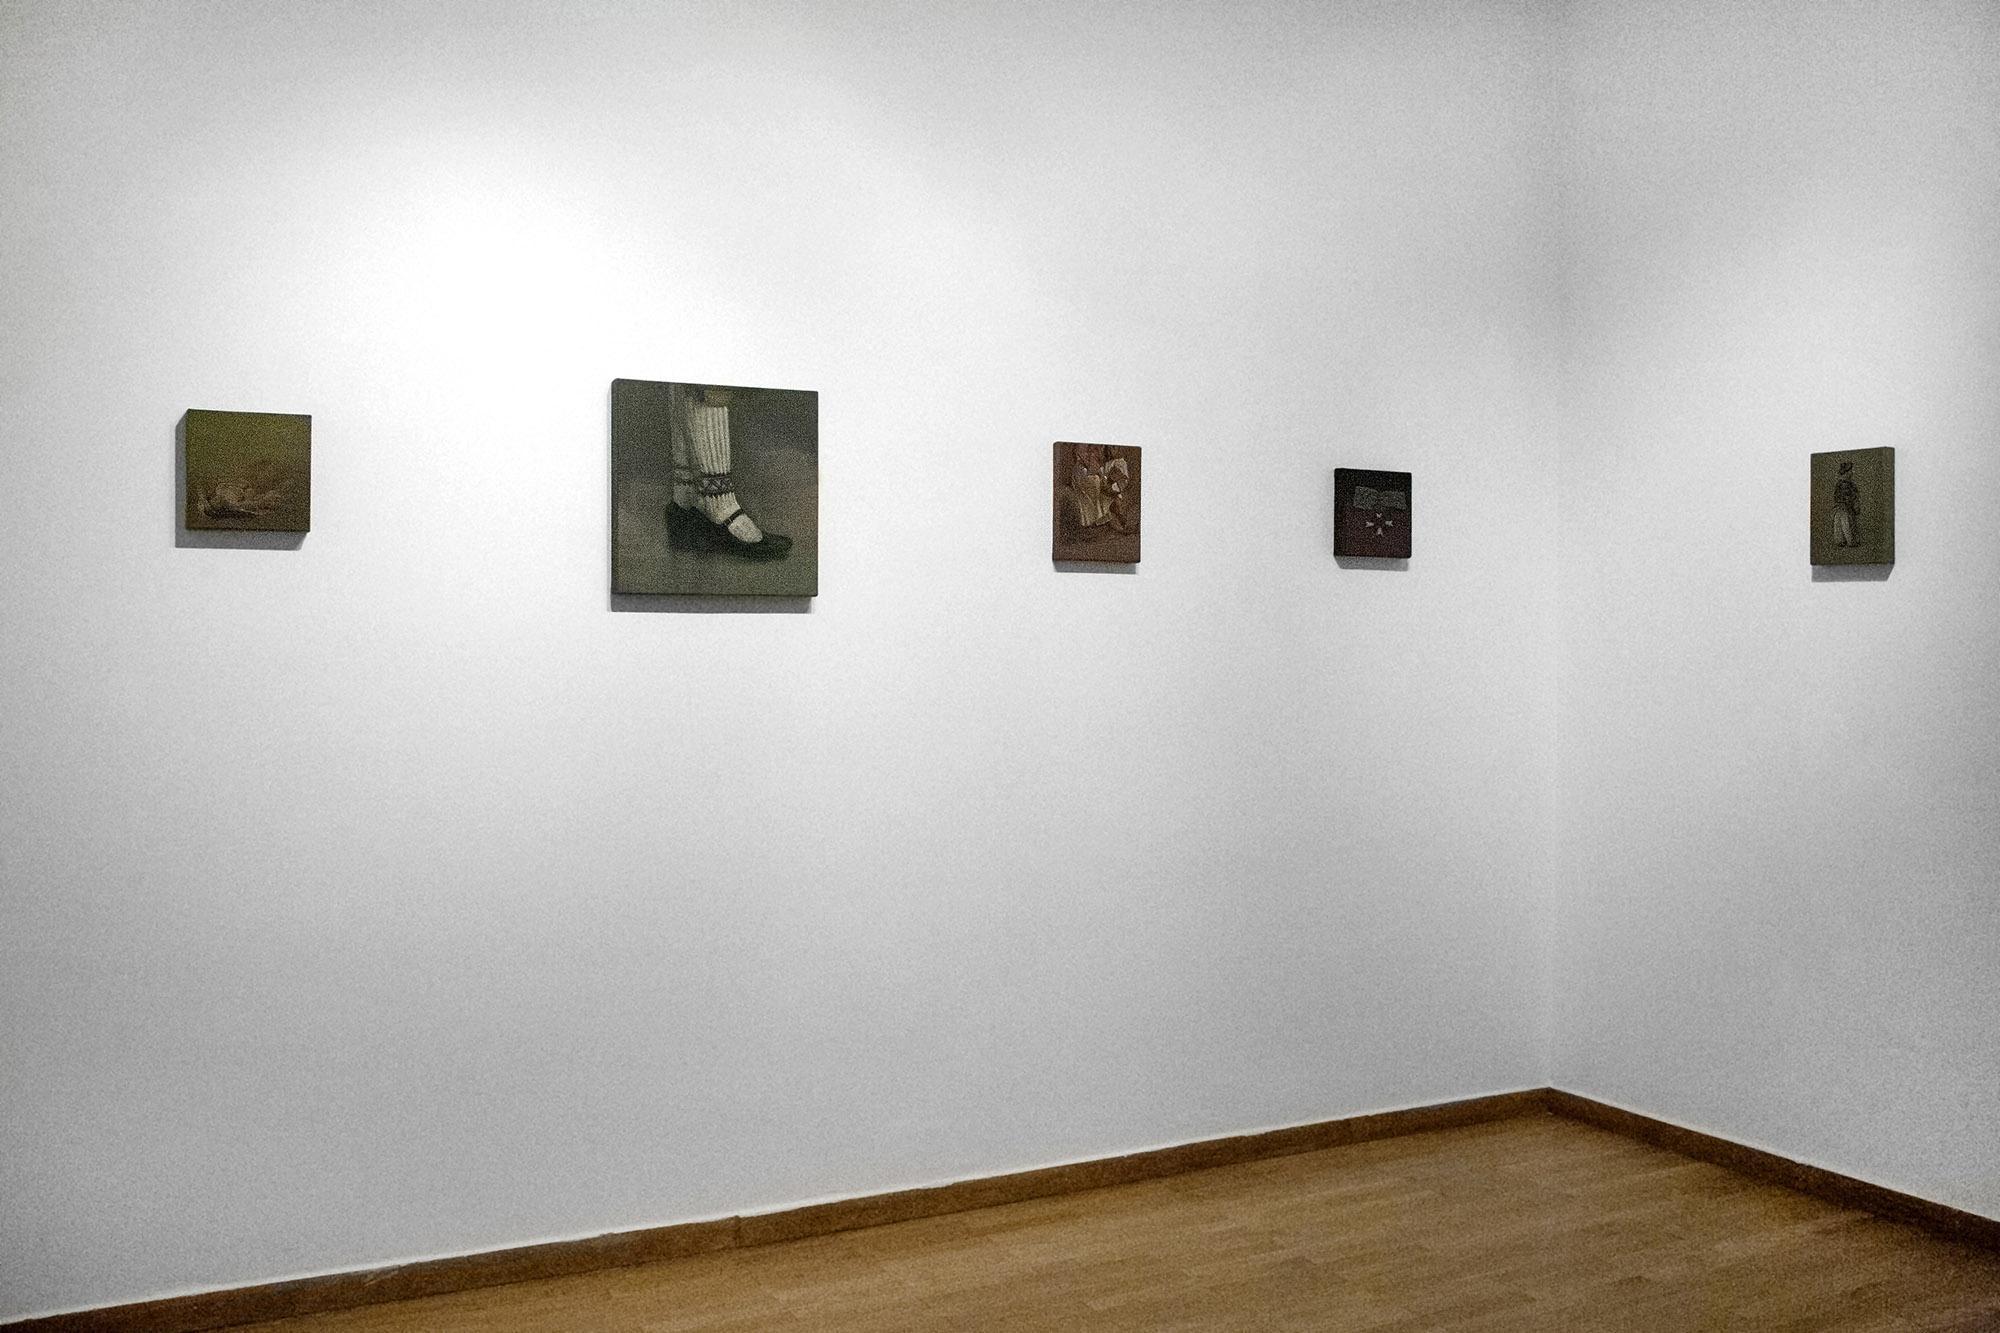 Vasilis Zografos / Missing - Image 1